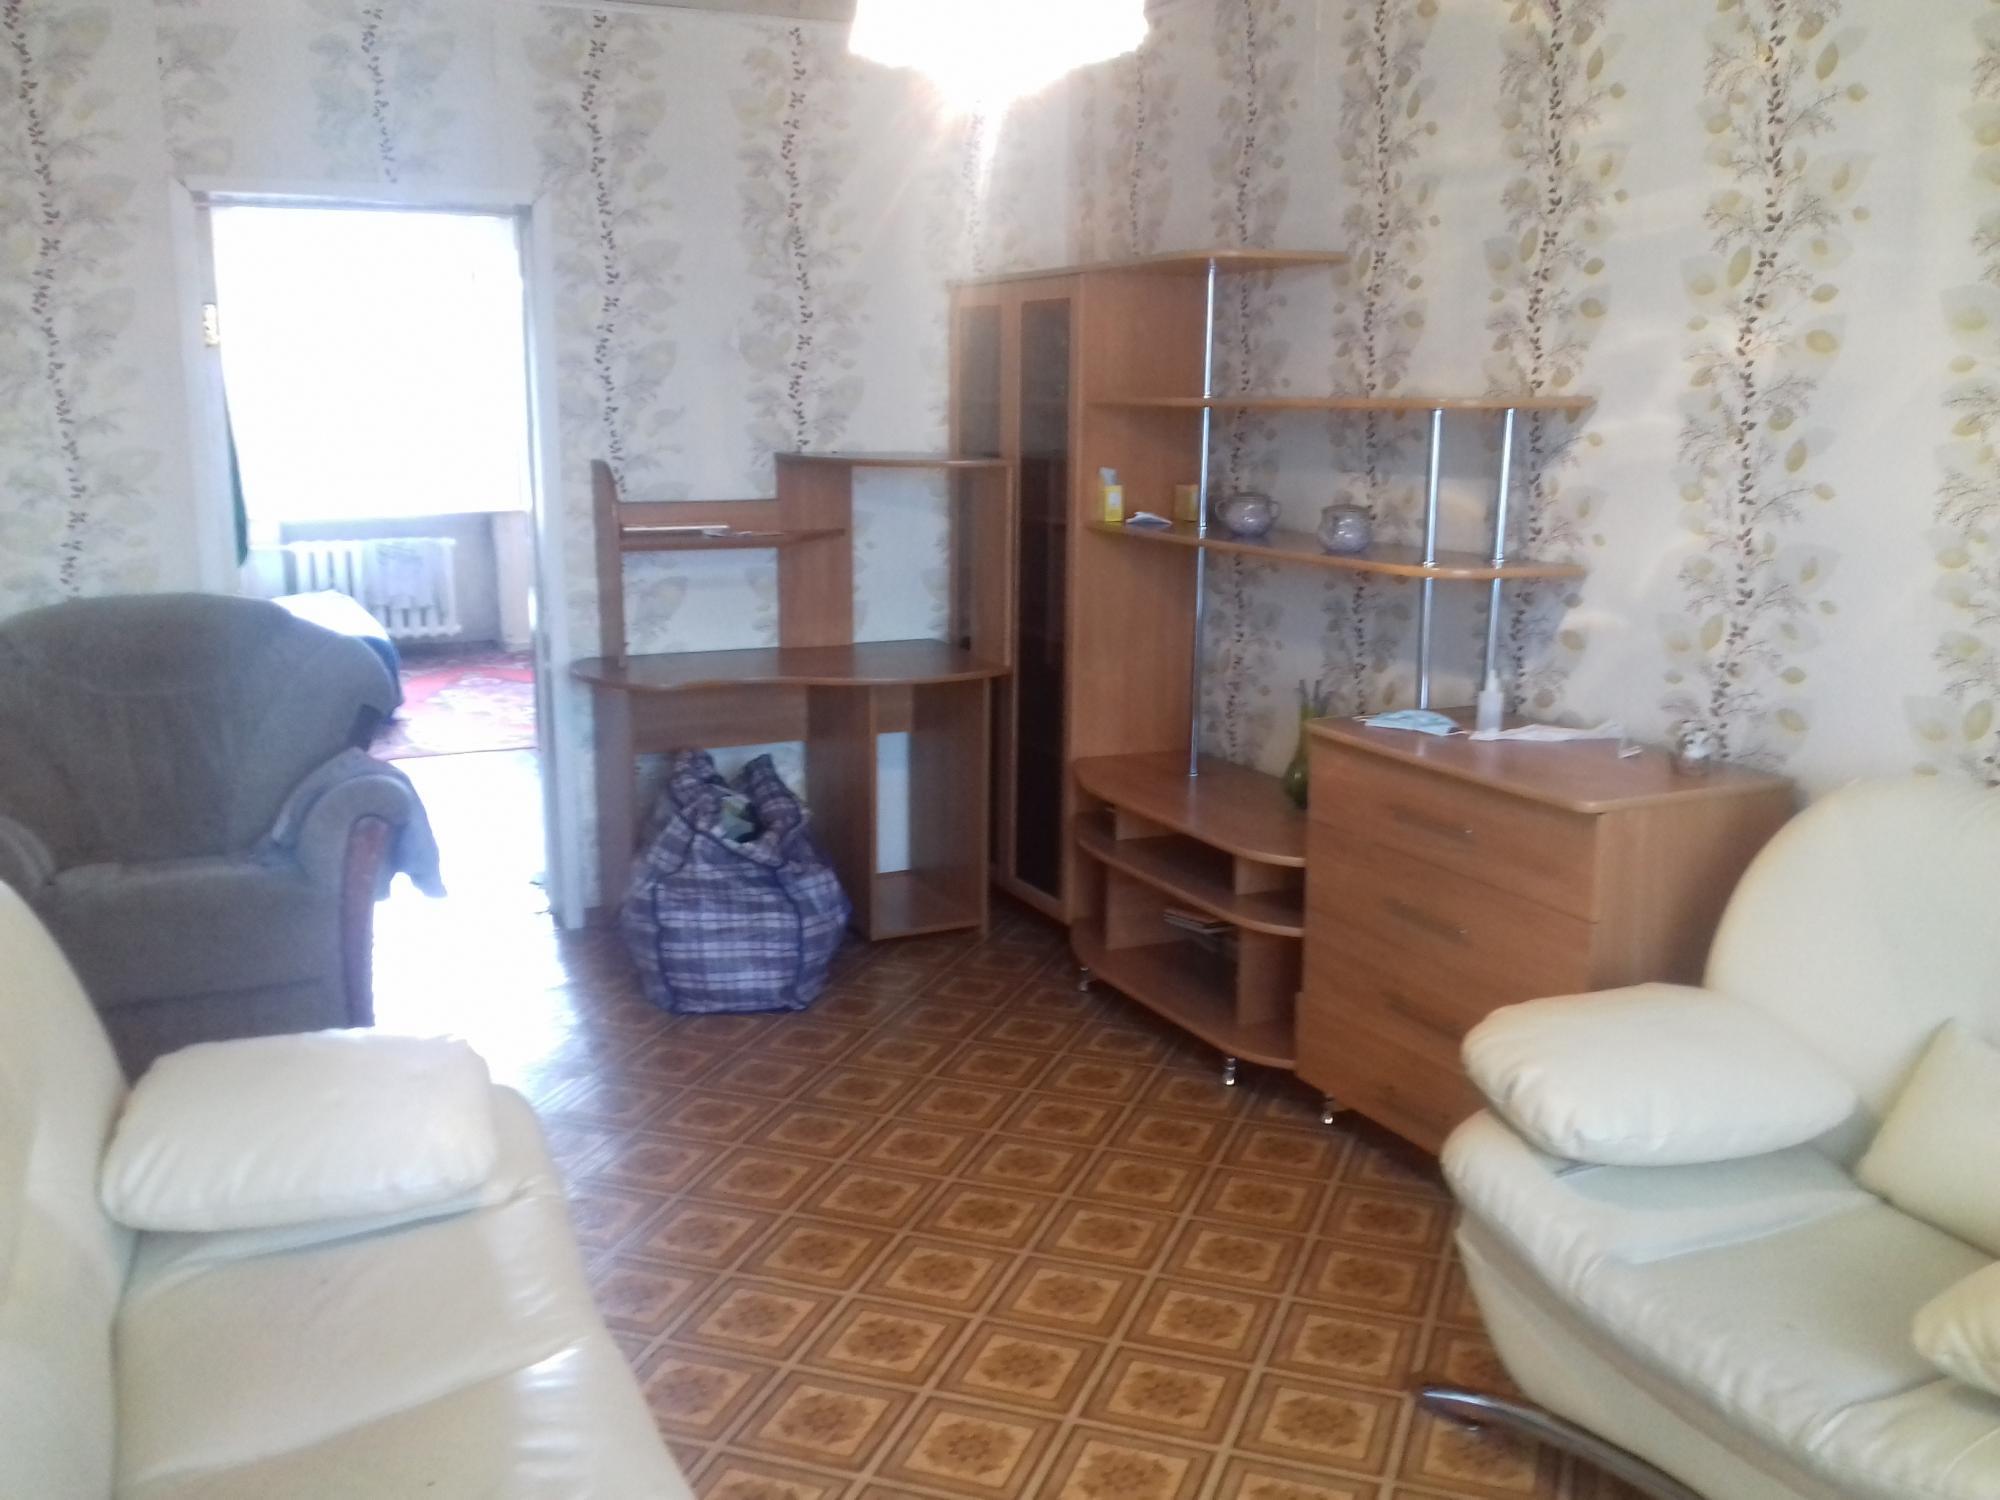 2к квартира Новосибирская улица, 39 | 18000 | аренда в Красноярске фото 1